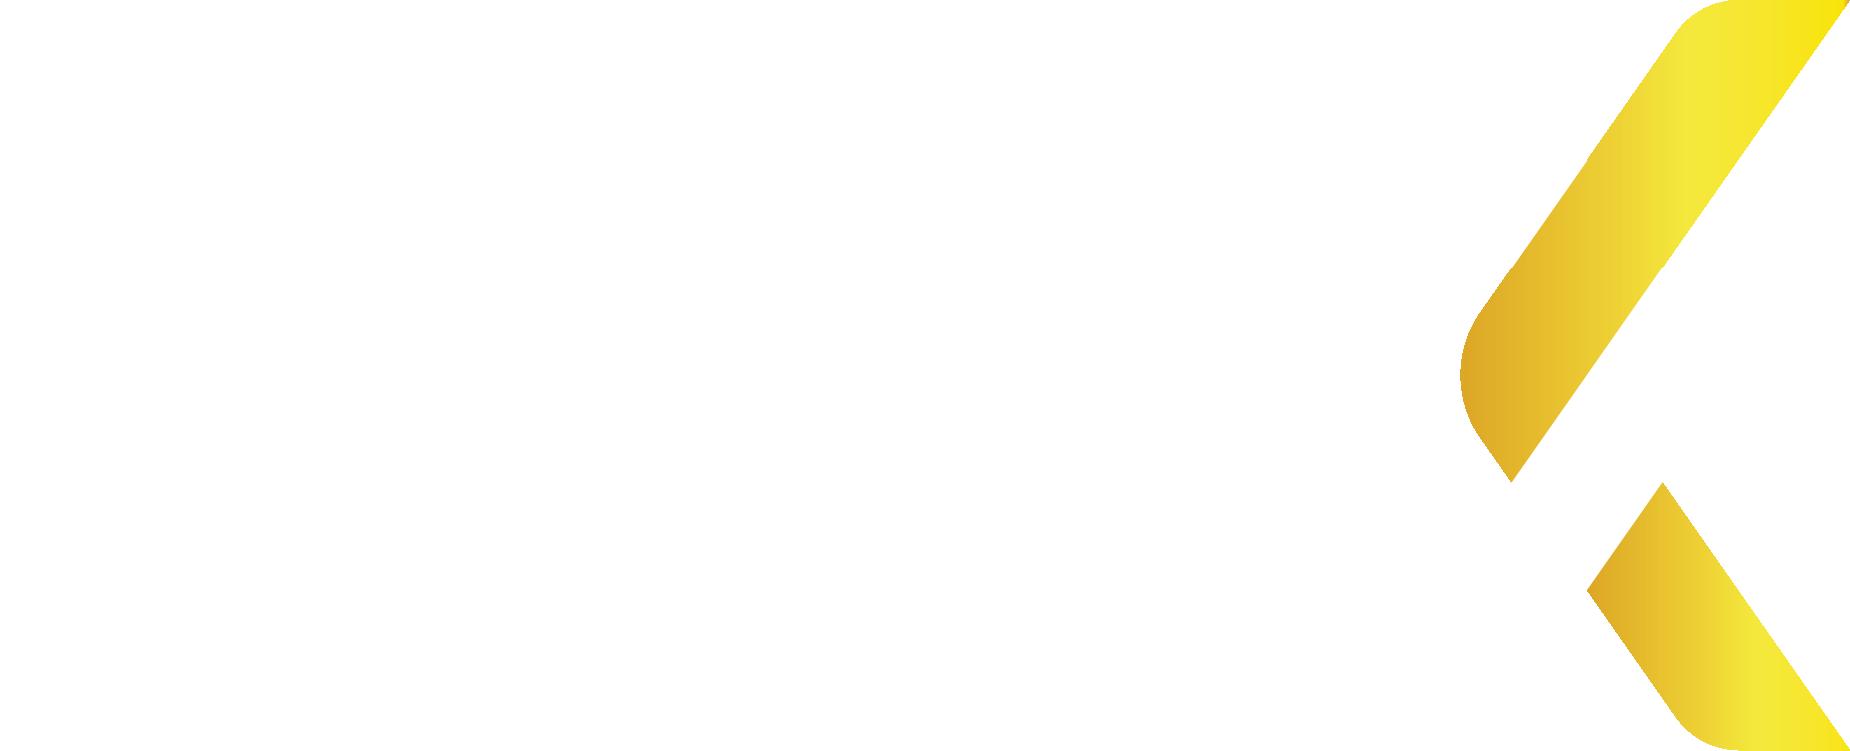 Học viện edX